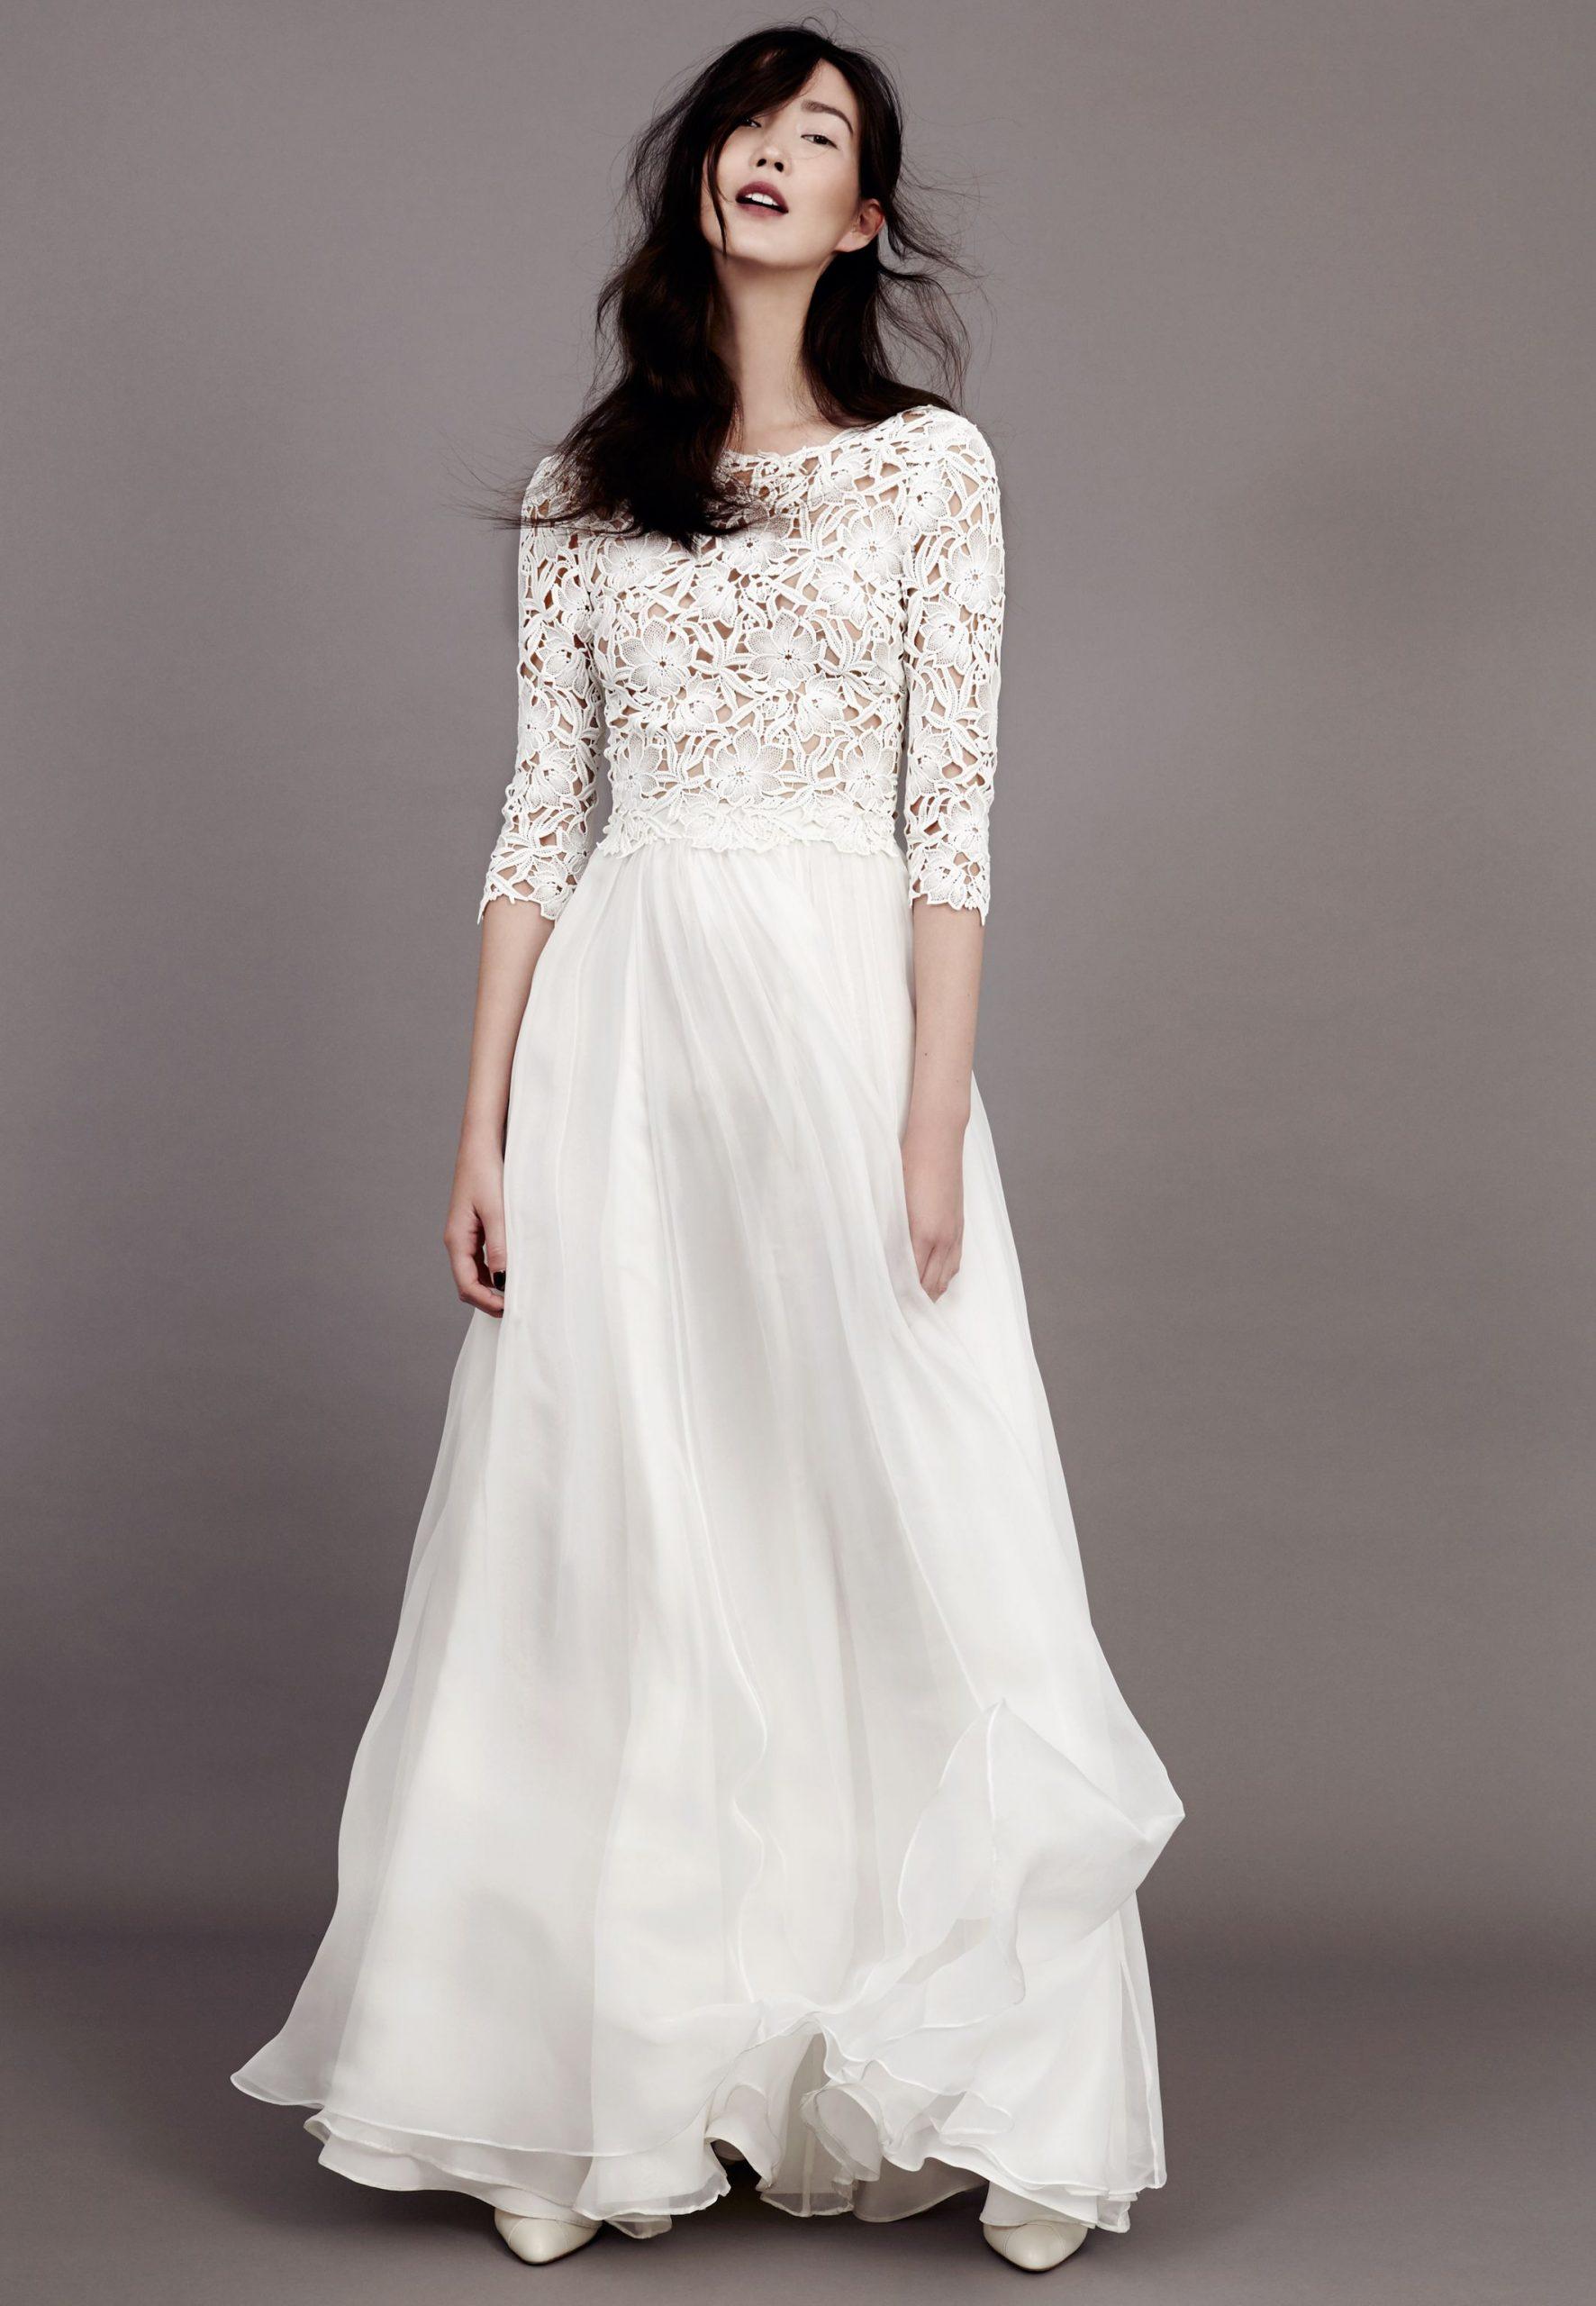 Kavier Gauche Papillon D'amour | Brautmode, Hochzeitskleid